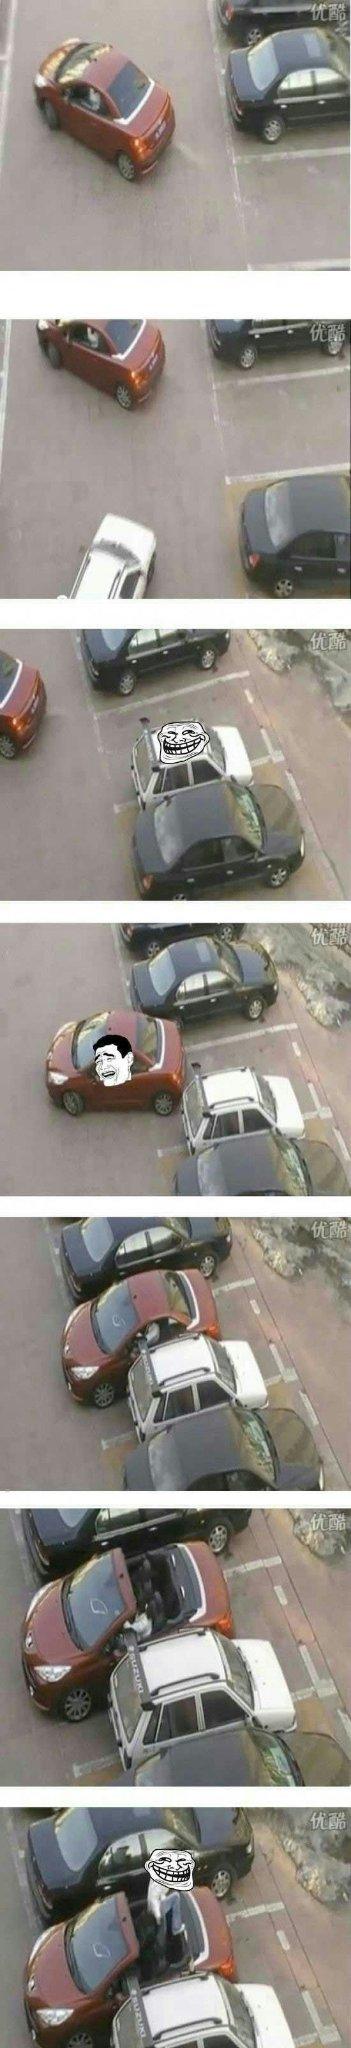 Troll car - meme